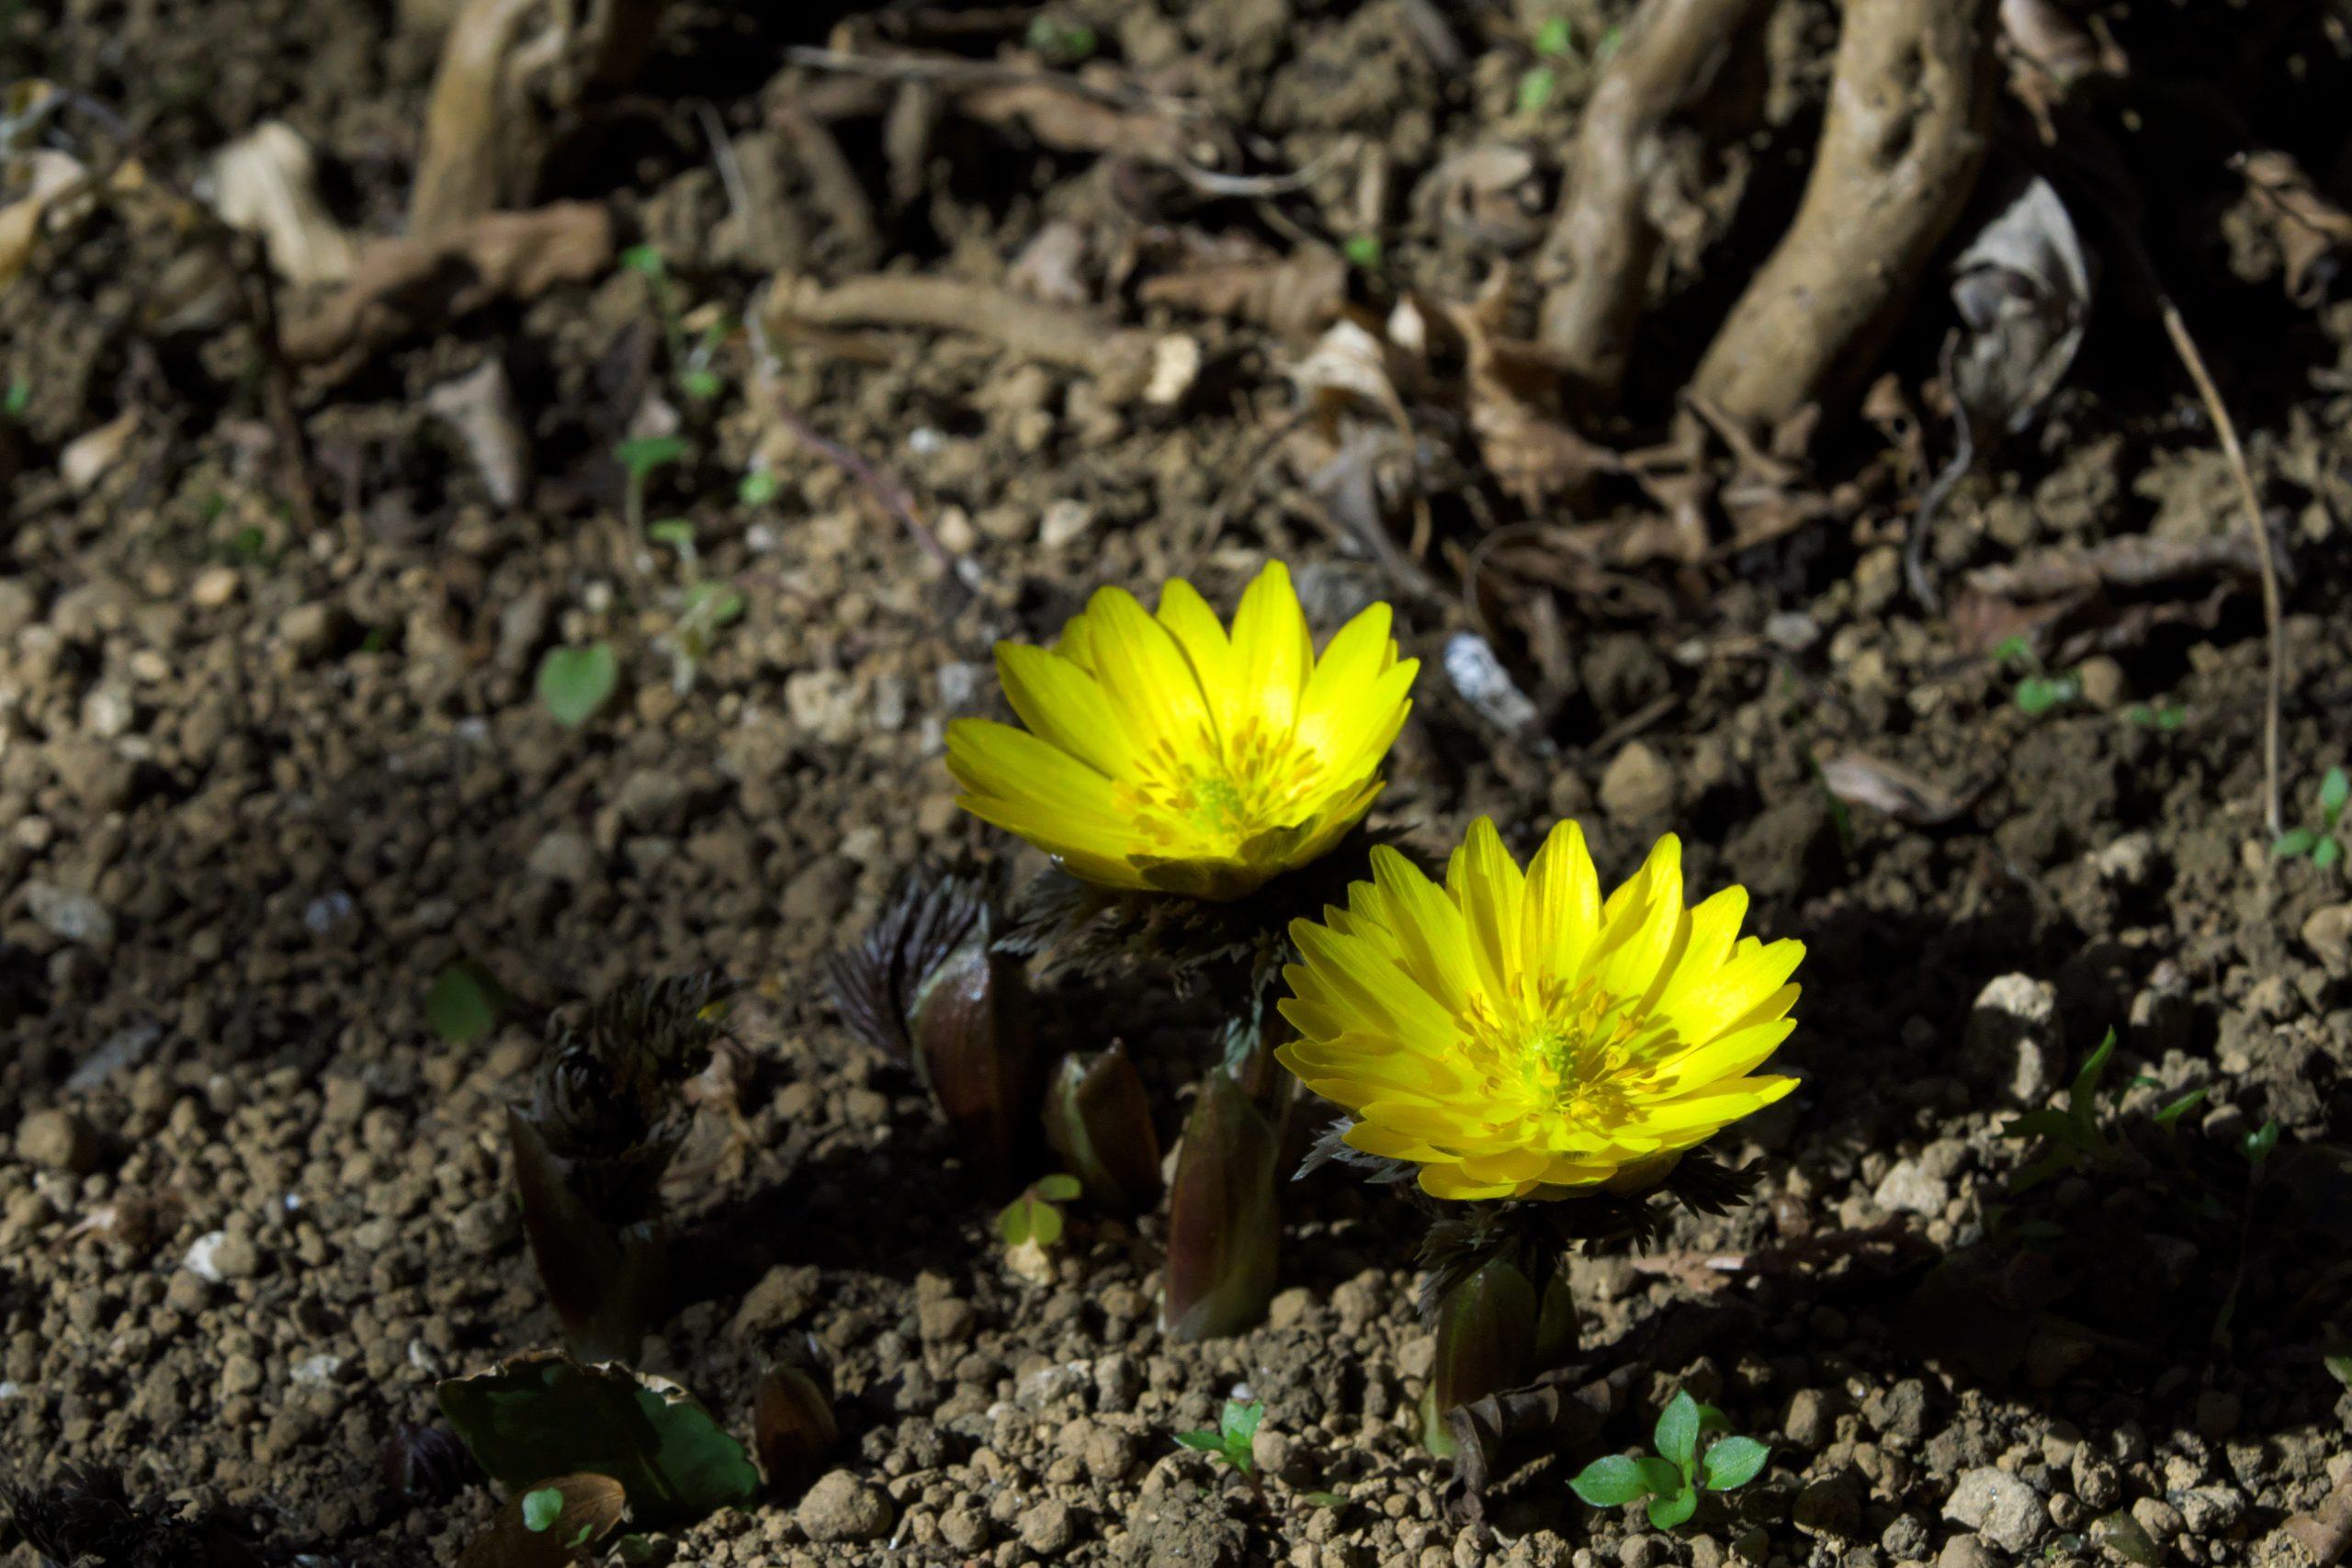 【SONY】この季節に咲く花(19)